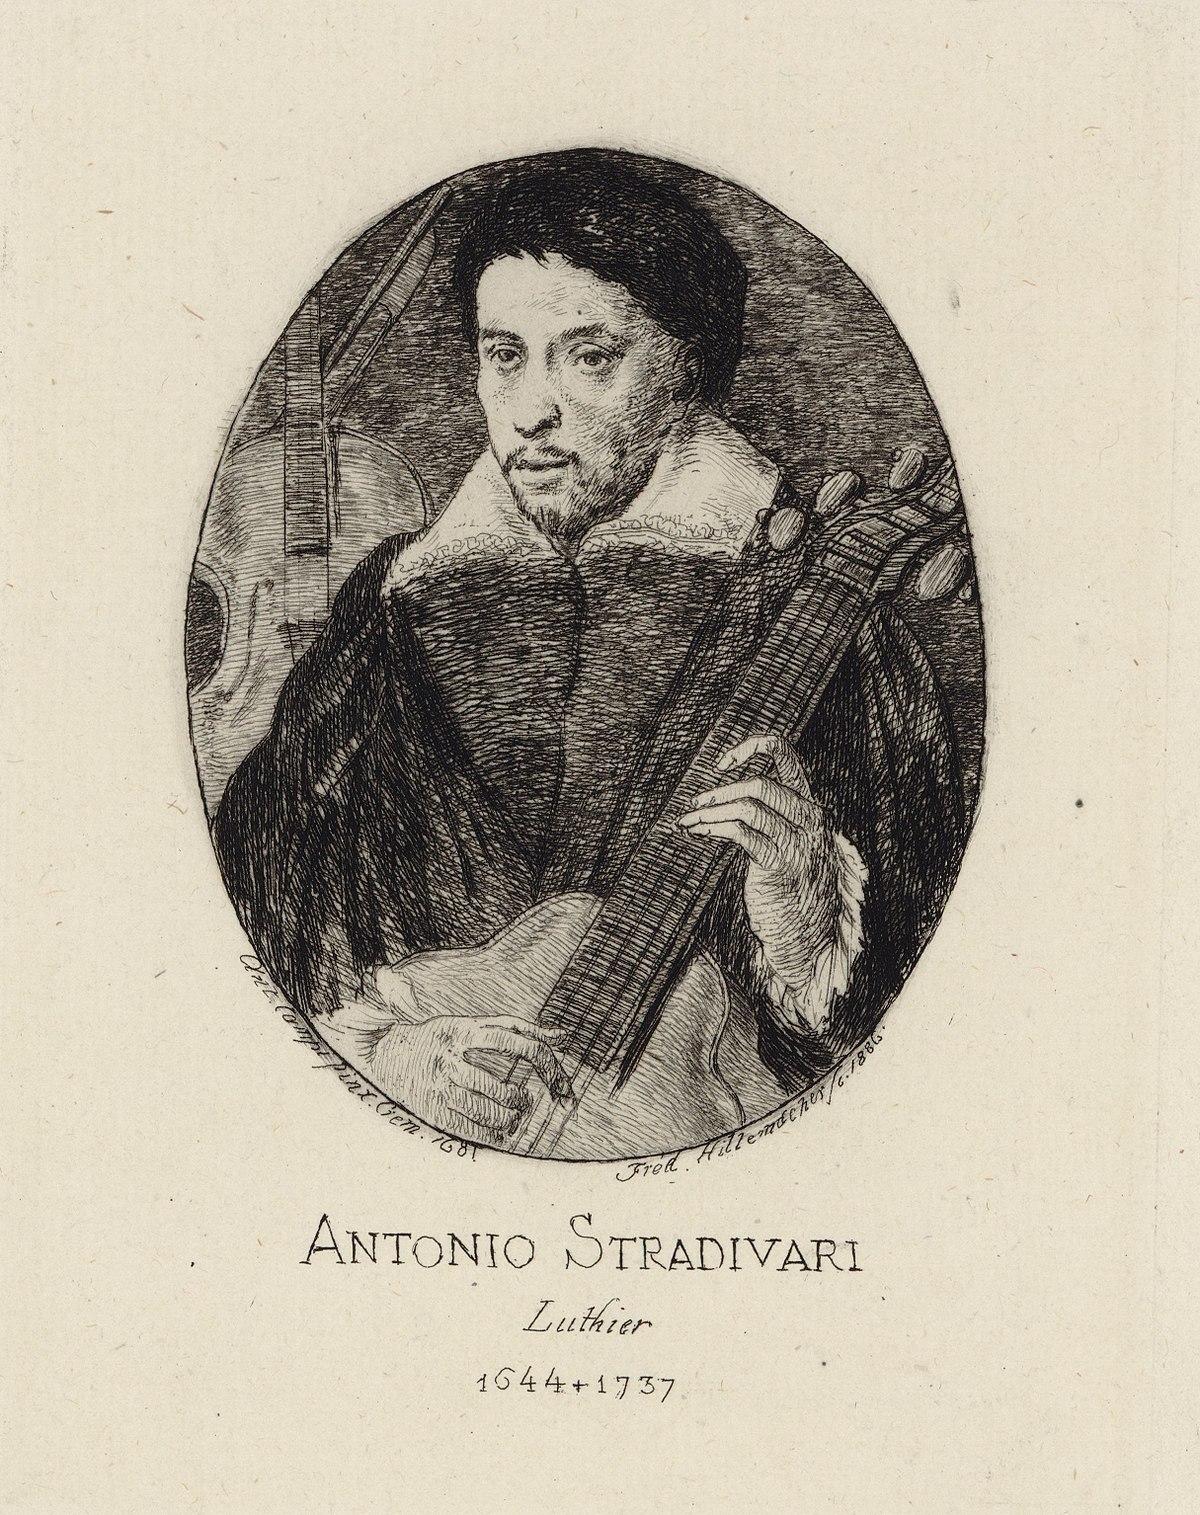 1200px-Antonio_Stradivari_portrait.jpg